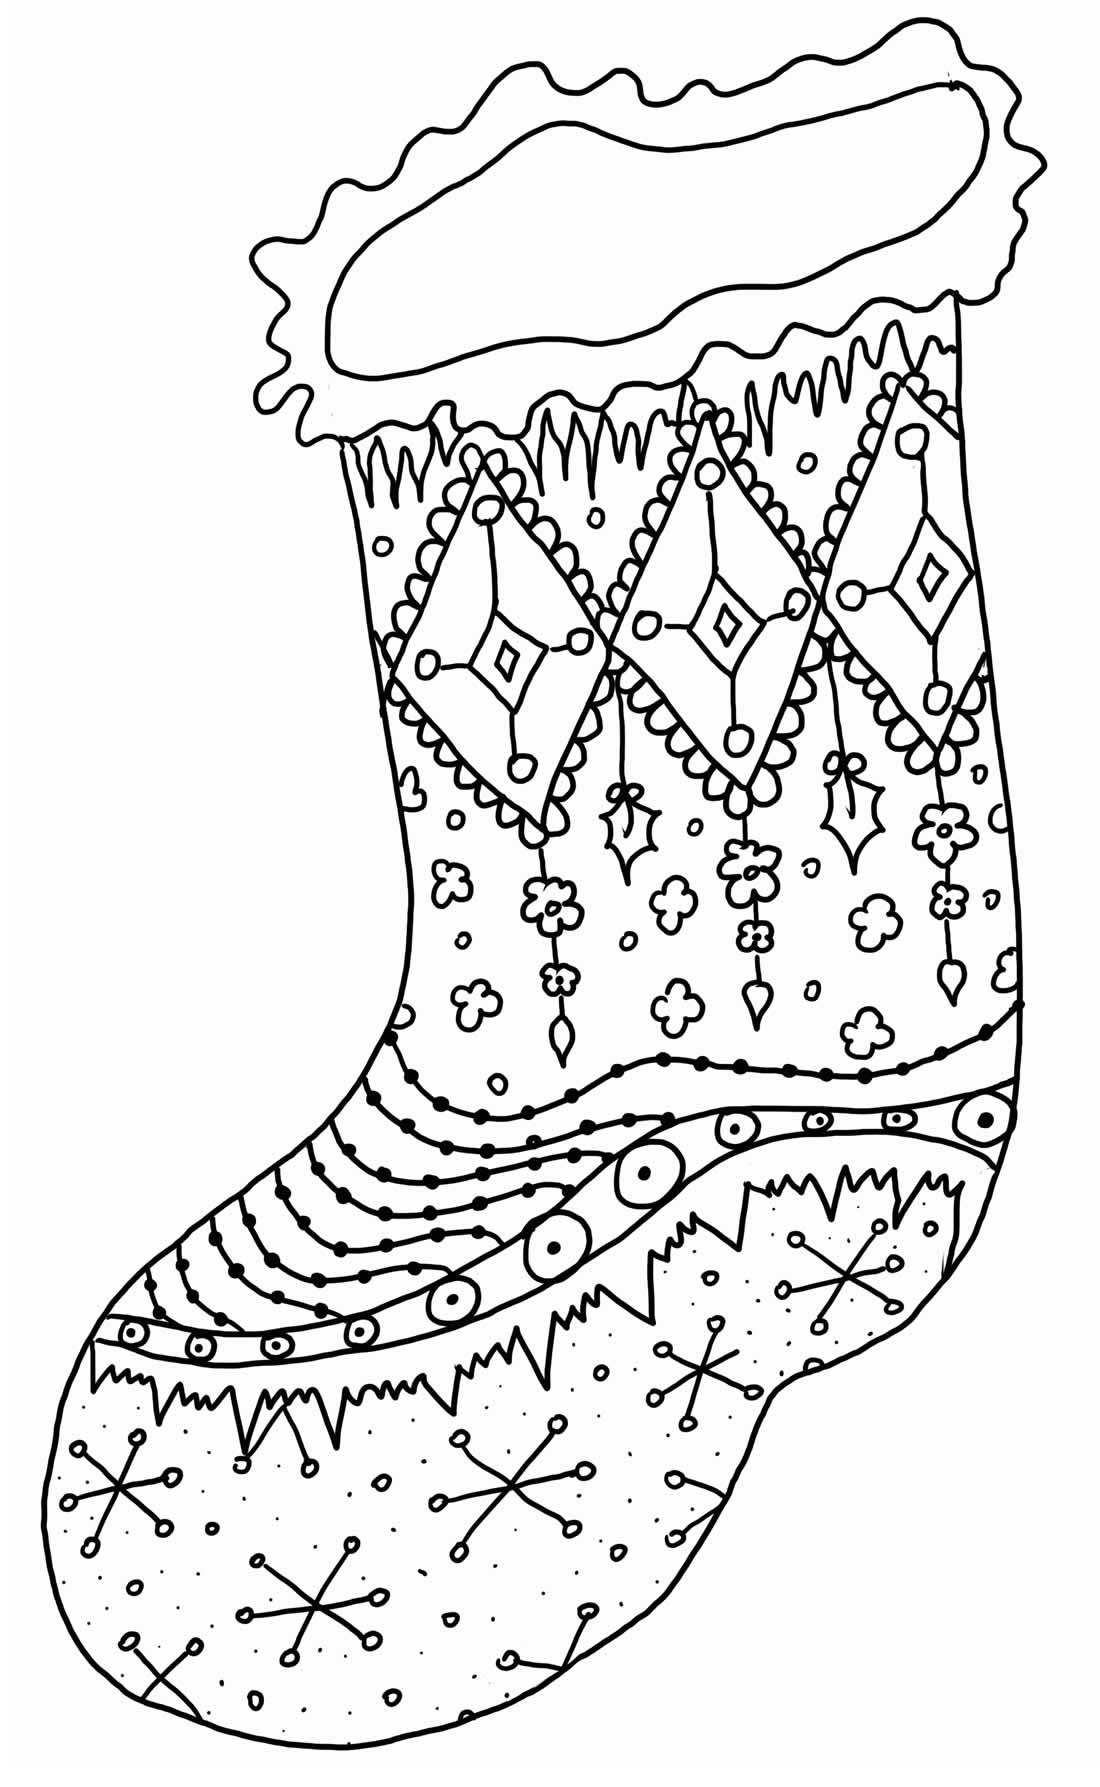 Imagem de Natal para colorir